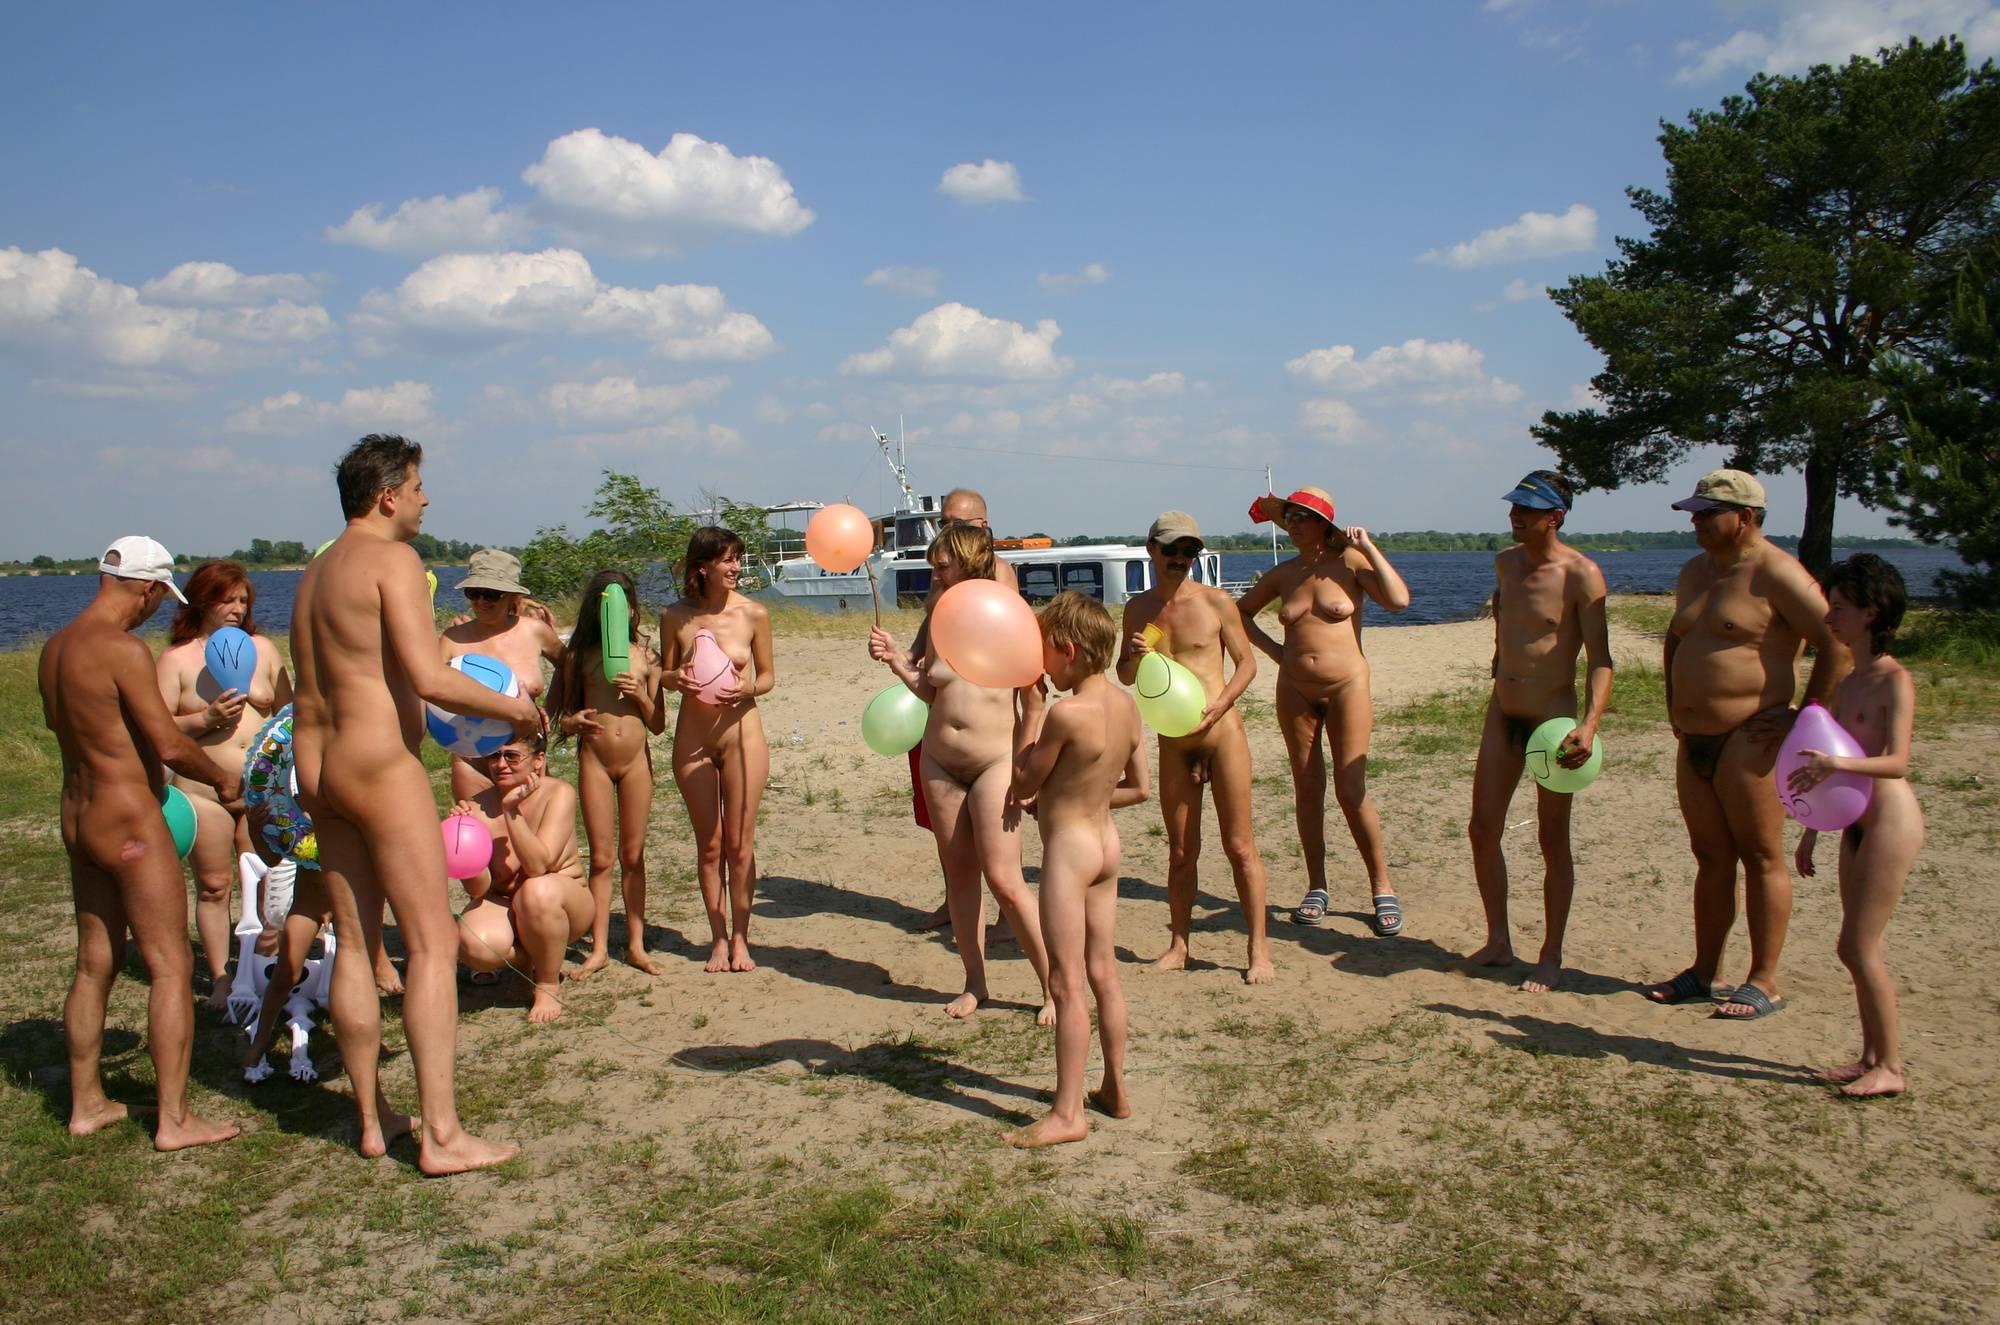 Nudist Pictures Kiev Balloon Fun Jamboree - 1